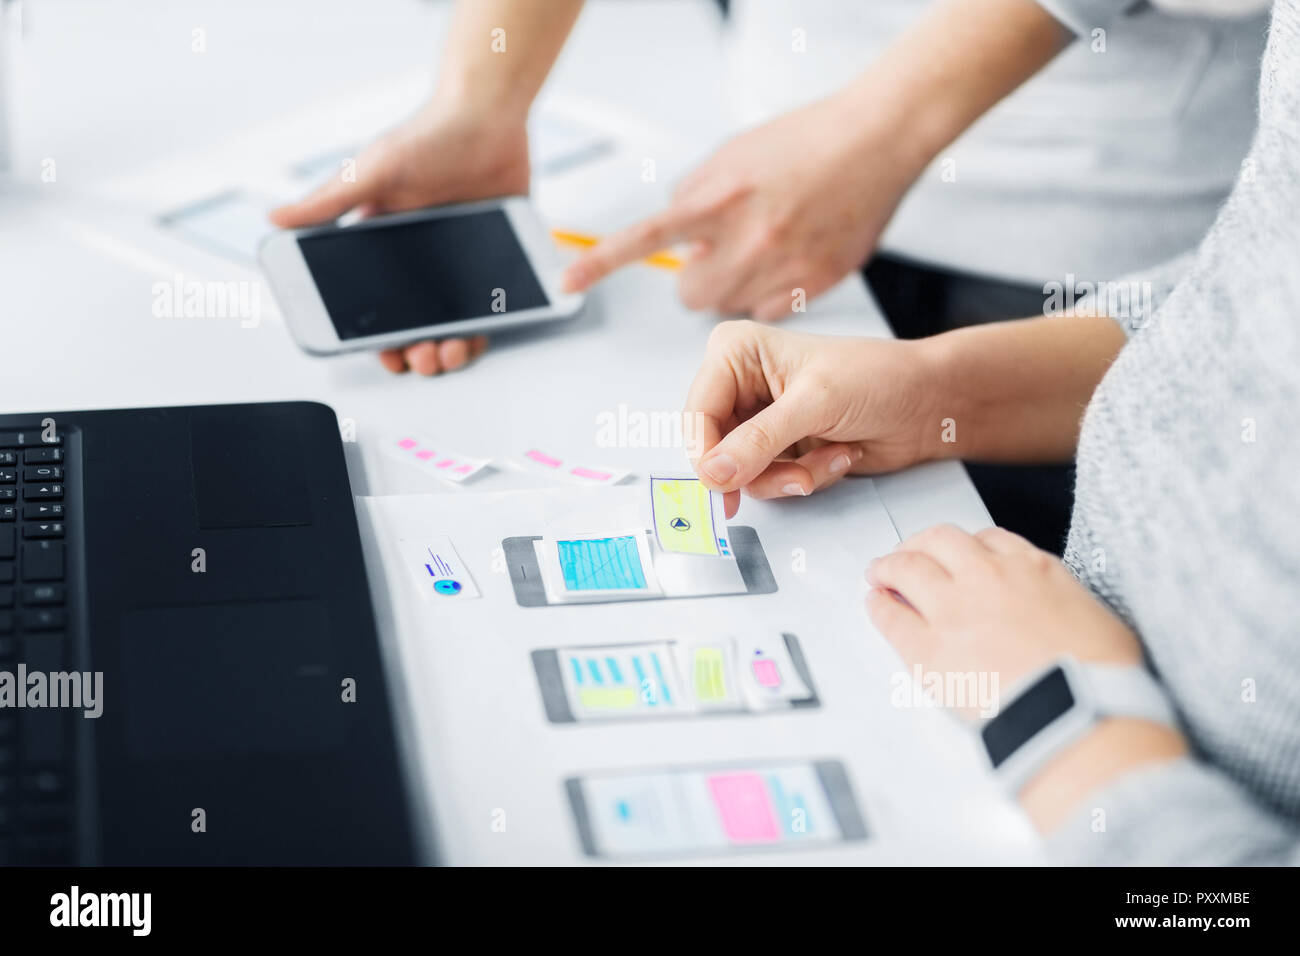 web designers creating mobile user interface - Stock Image